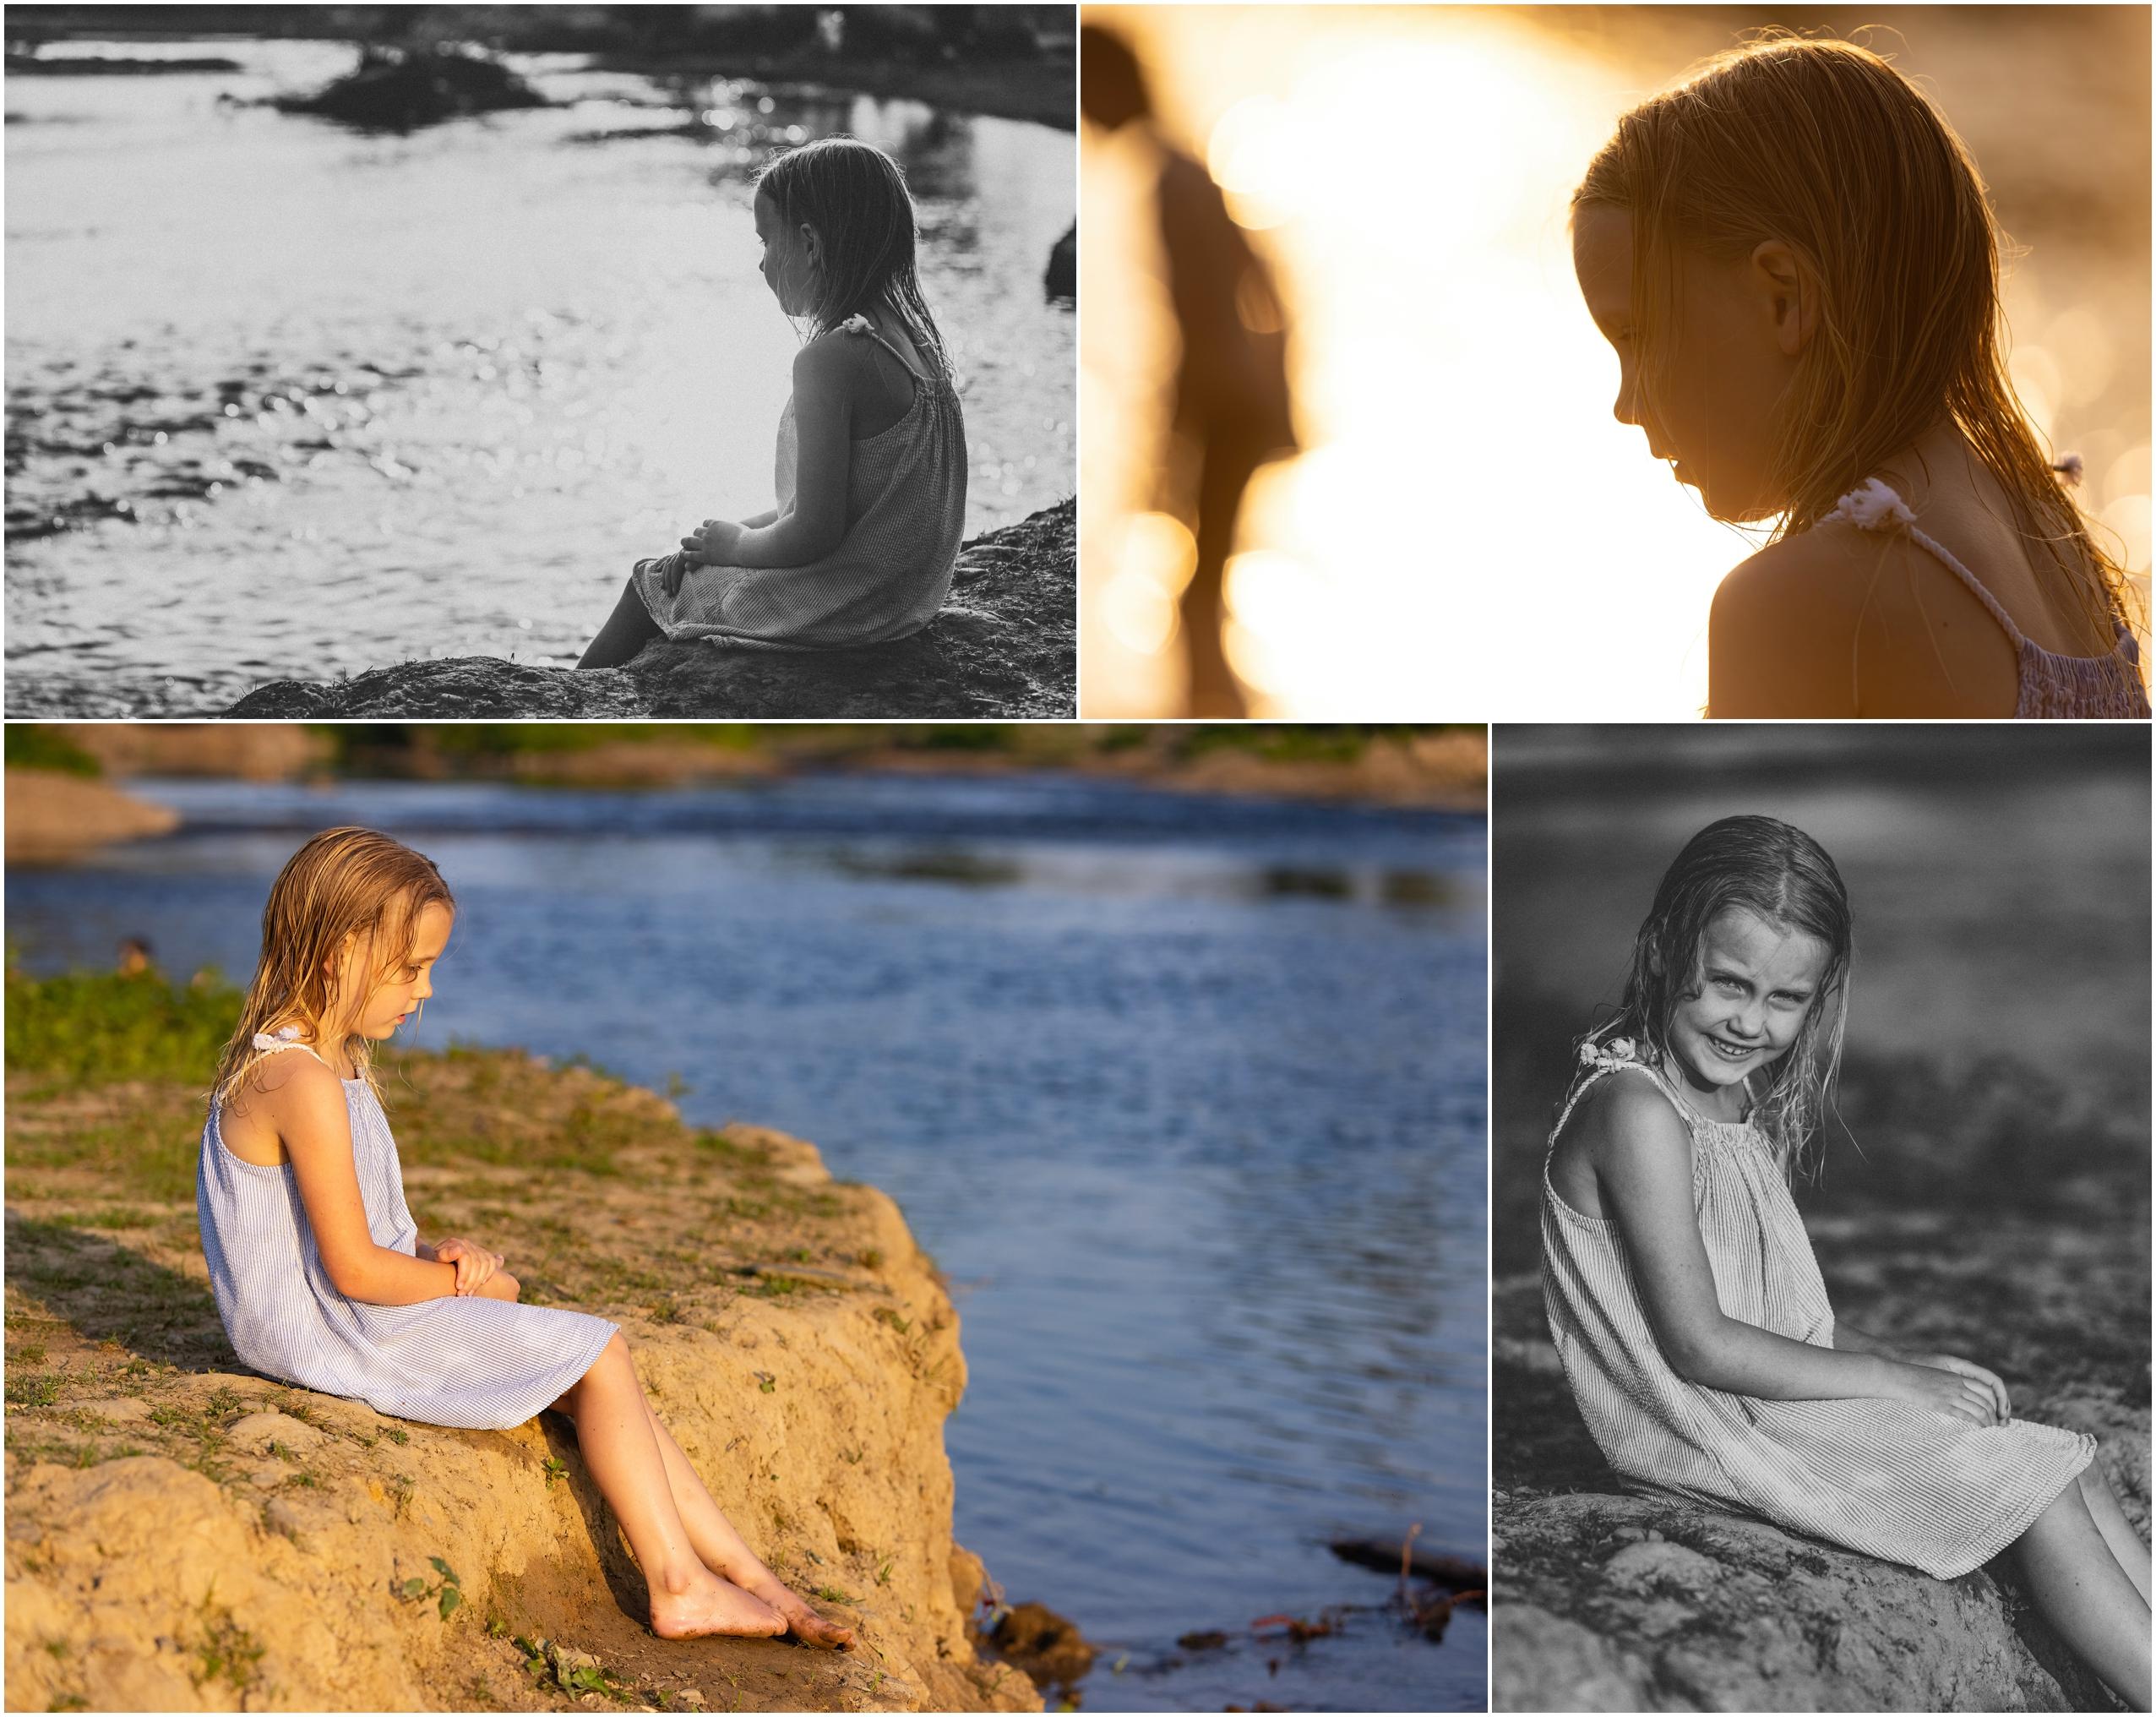 Britta-Passmann-Fotografie_Dortmund_Outdoorshooting_Sommeraktion_Familienfotos_Kinderfotos_Fotoshooting